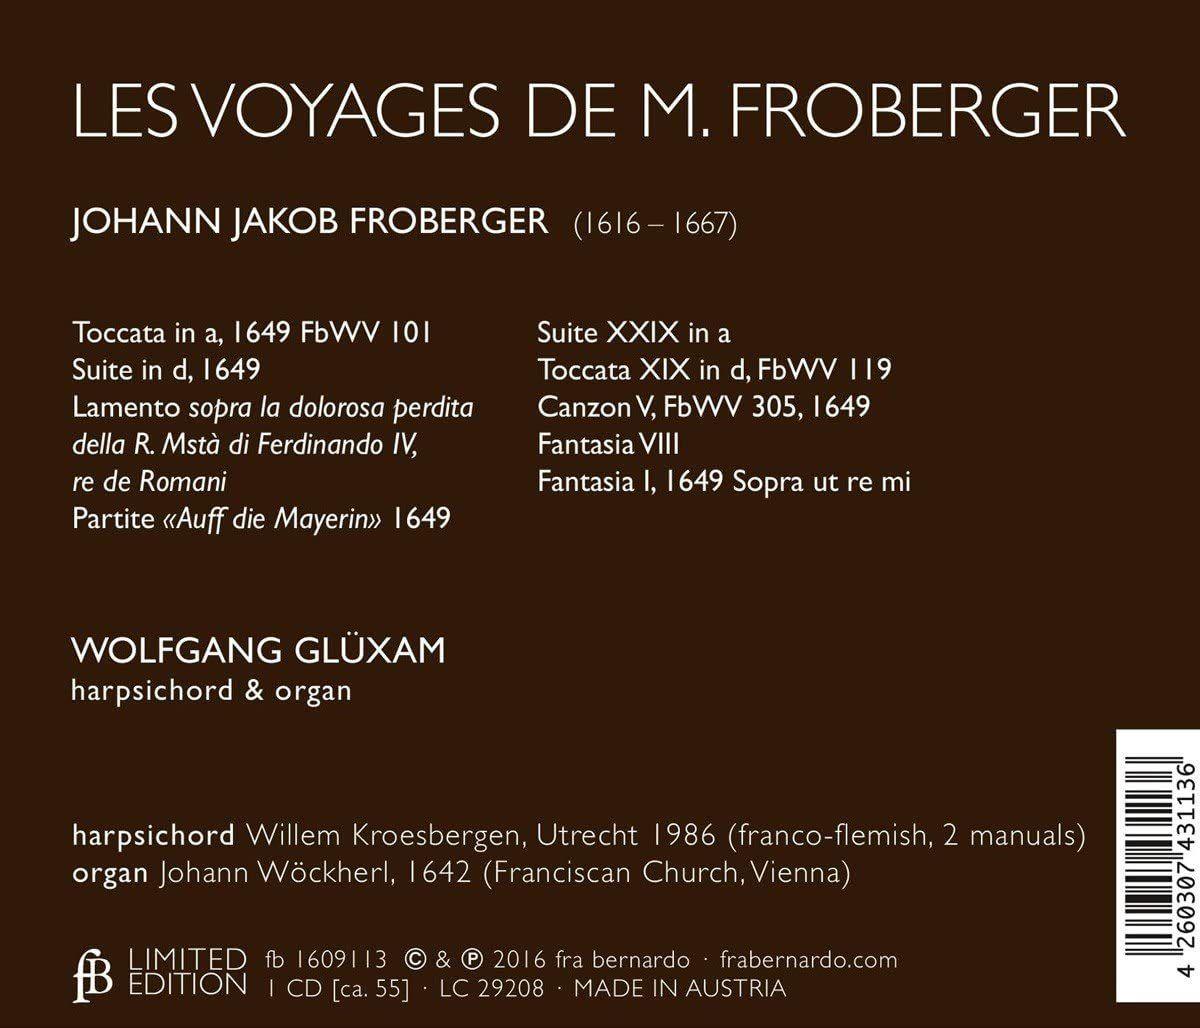 Photo No.2 of Johann Jakob Froberger: Les Voyages de M. Froberger